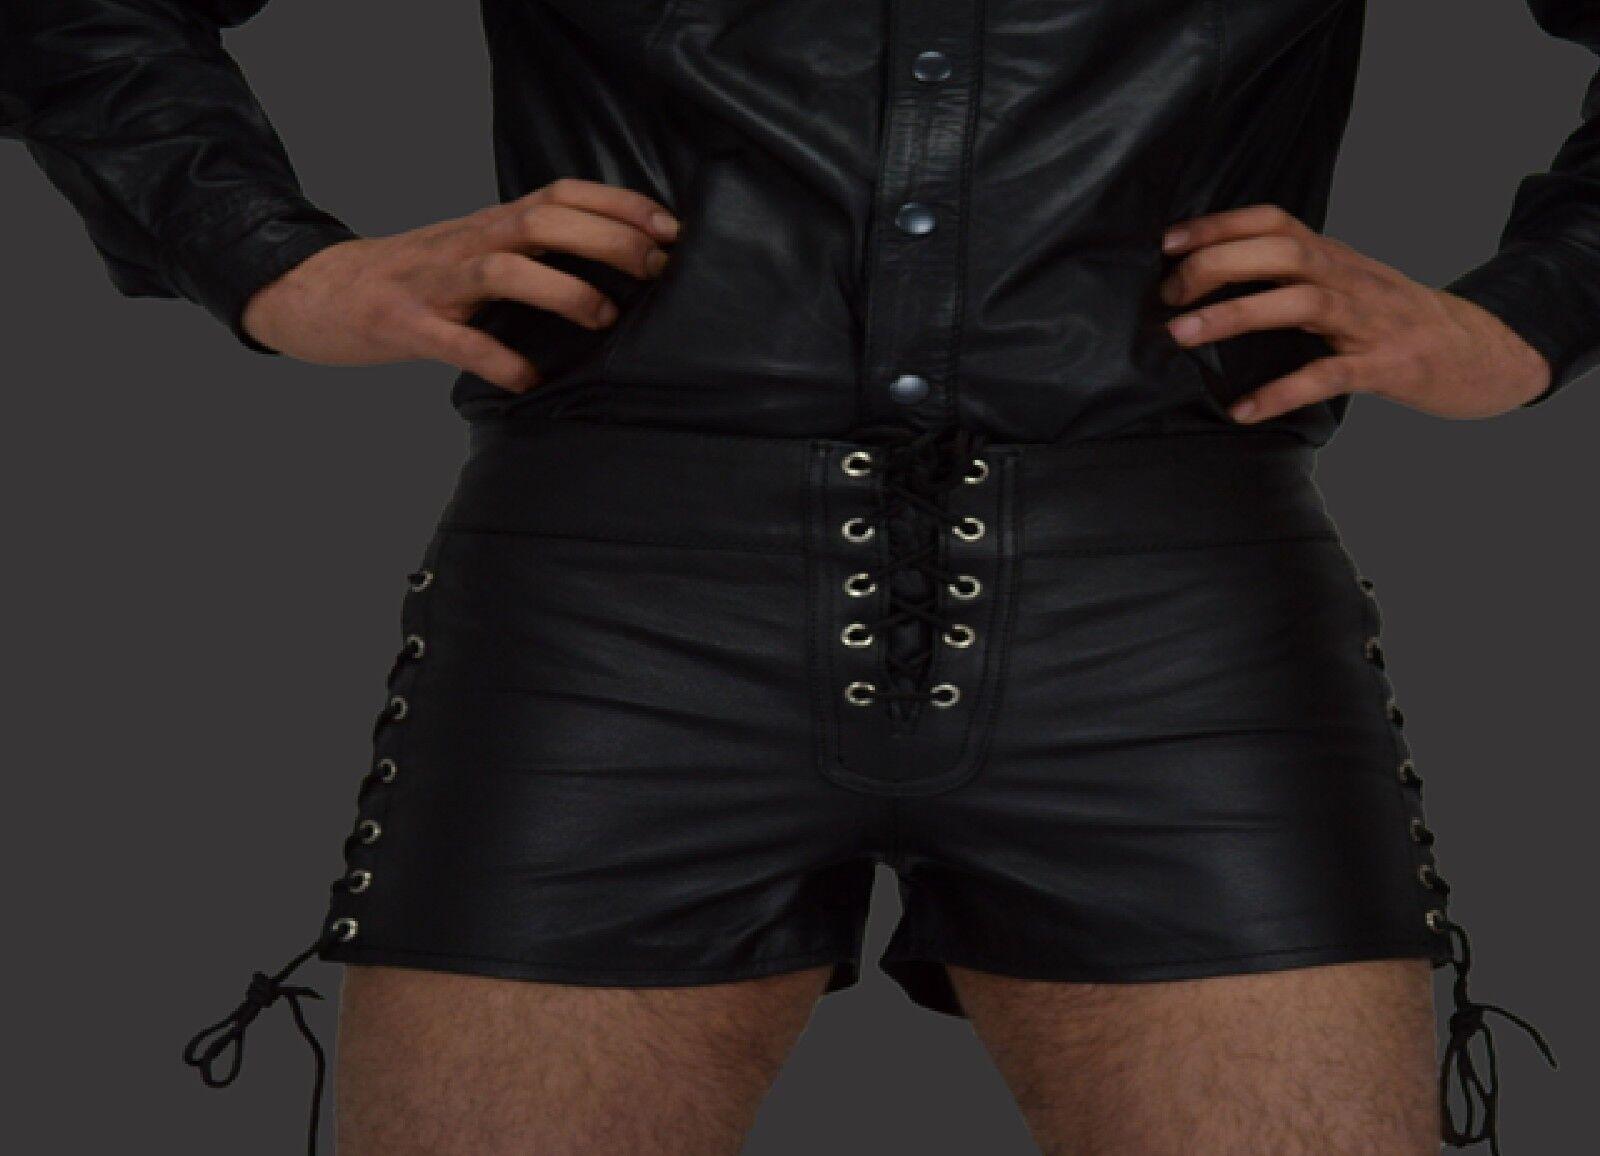 Unisexe Shorts, Cuir Shorts pour schnürn Cuir Shorts, Unisexe Pantalon, Pantalon Cuir, Leather shorts.gr.34w 6c29e8